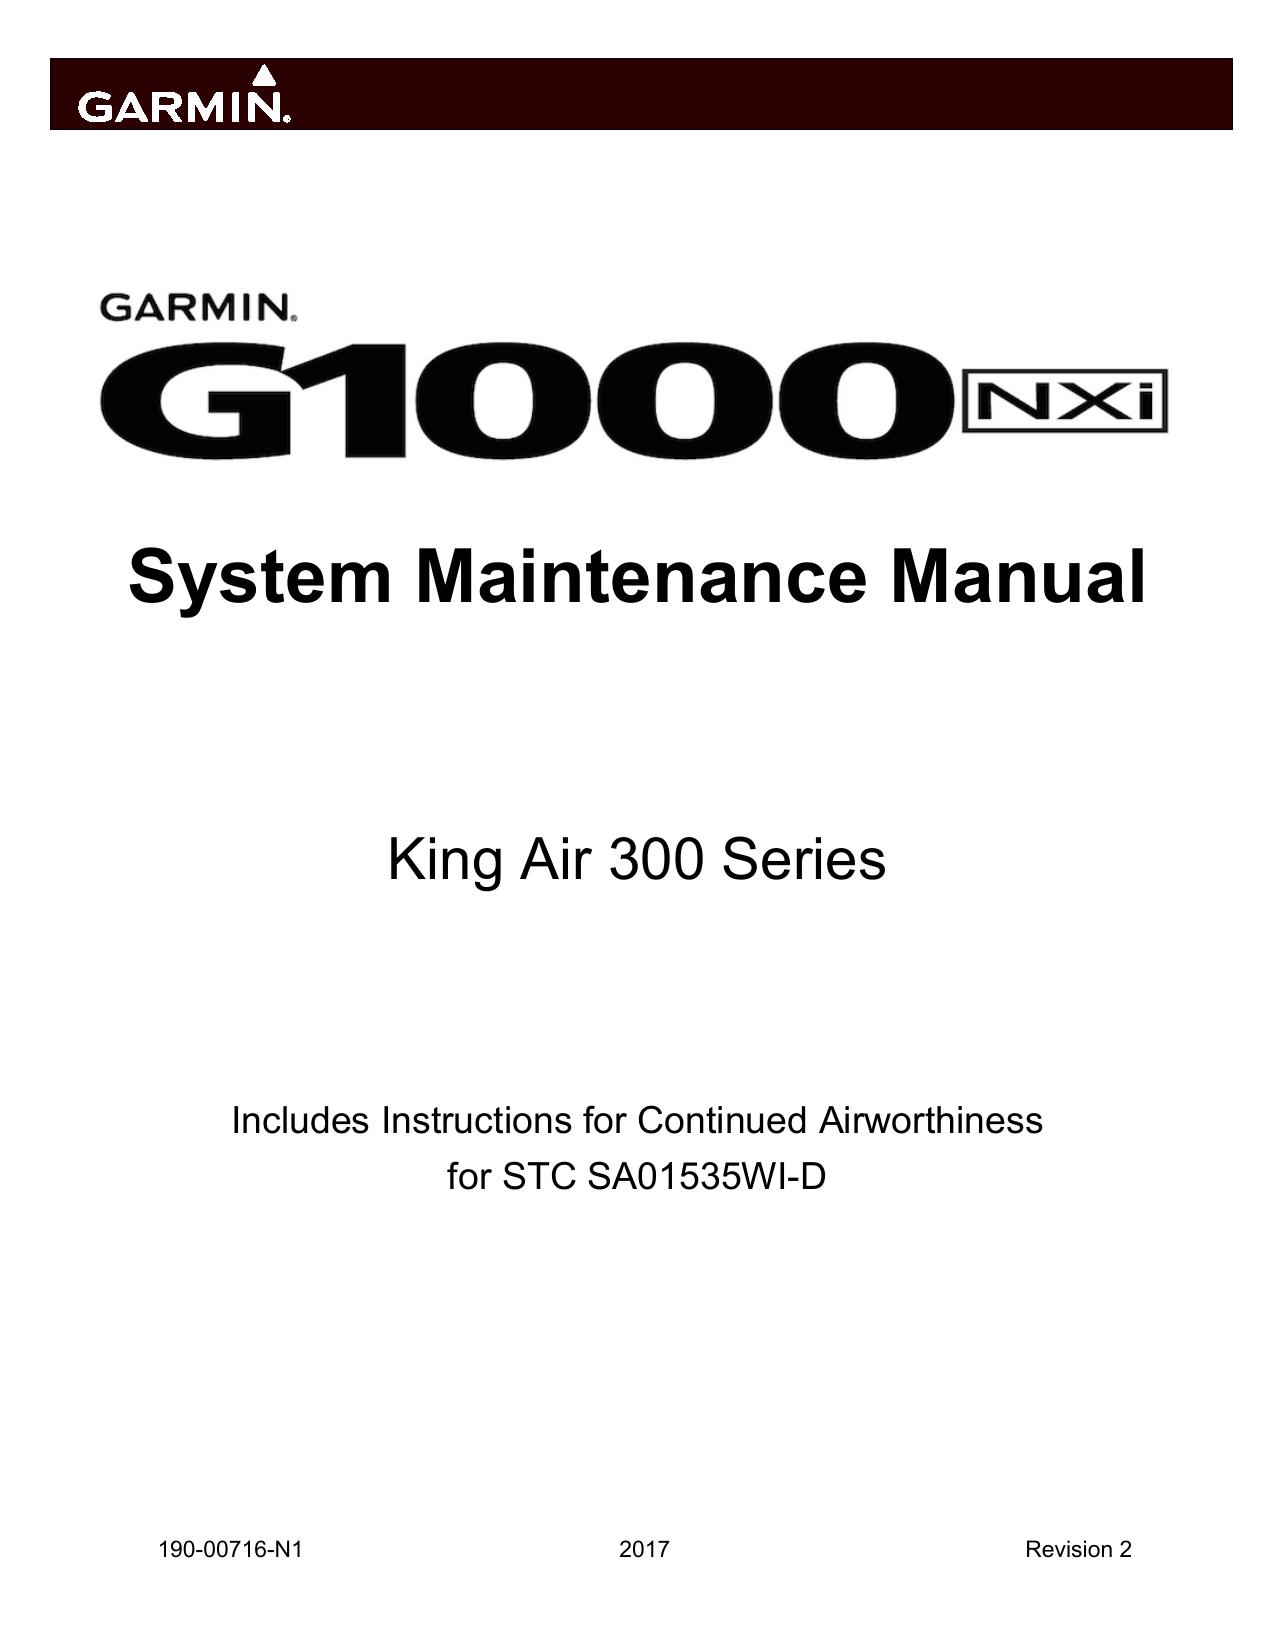 Garmin G1000 NXi: Beechcraft King Air 300/B300 User manual